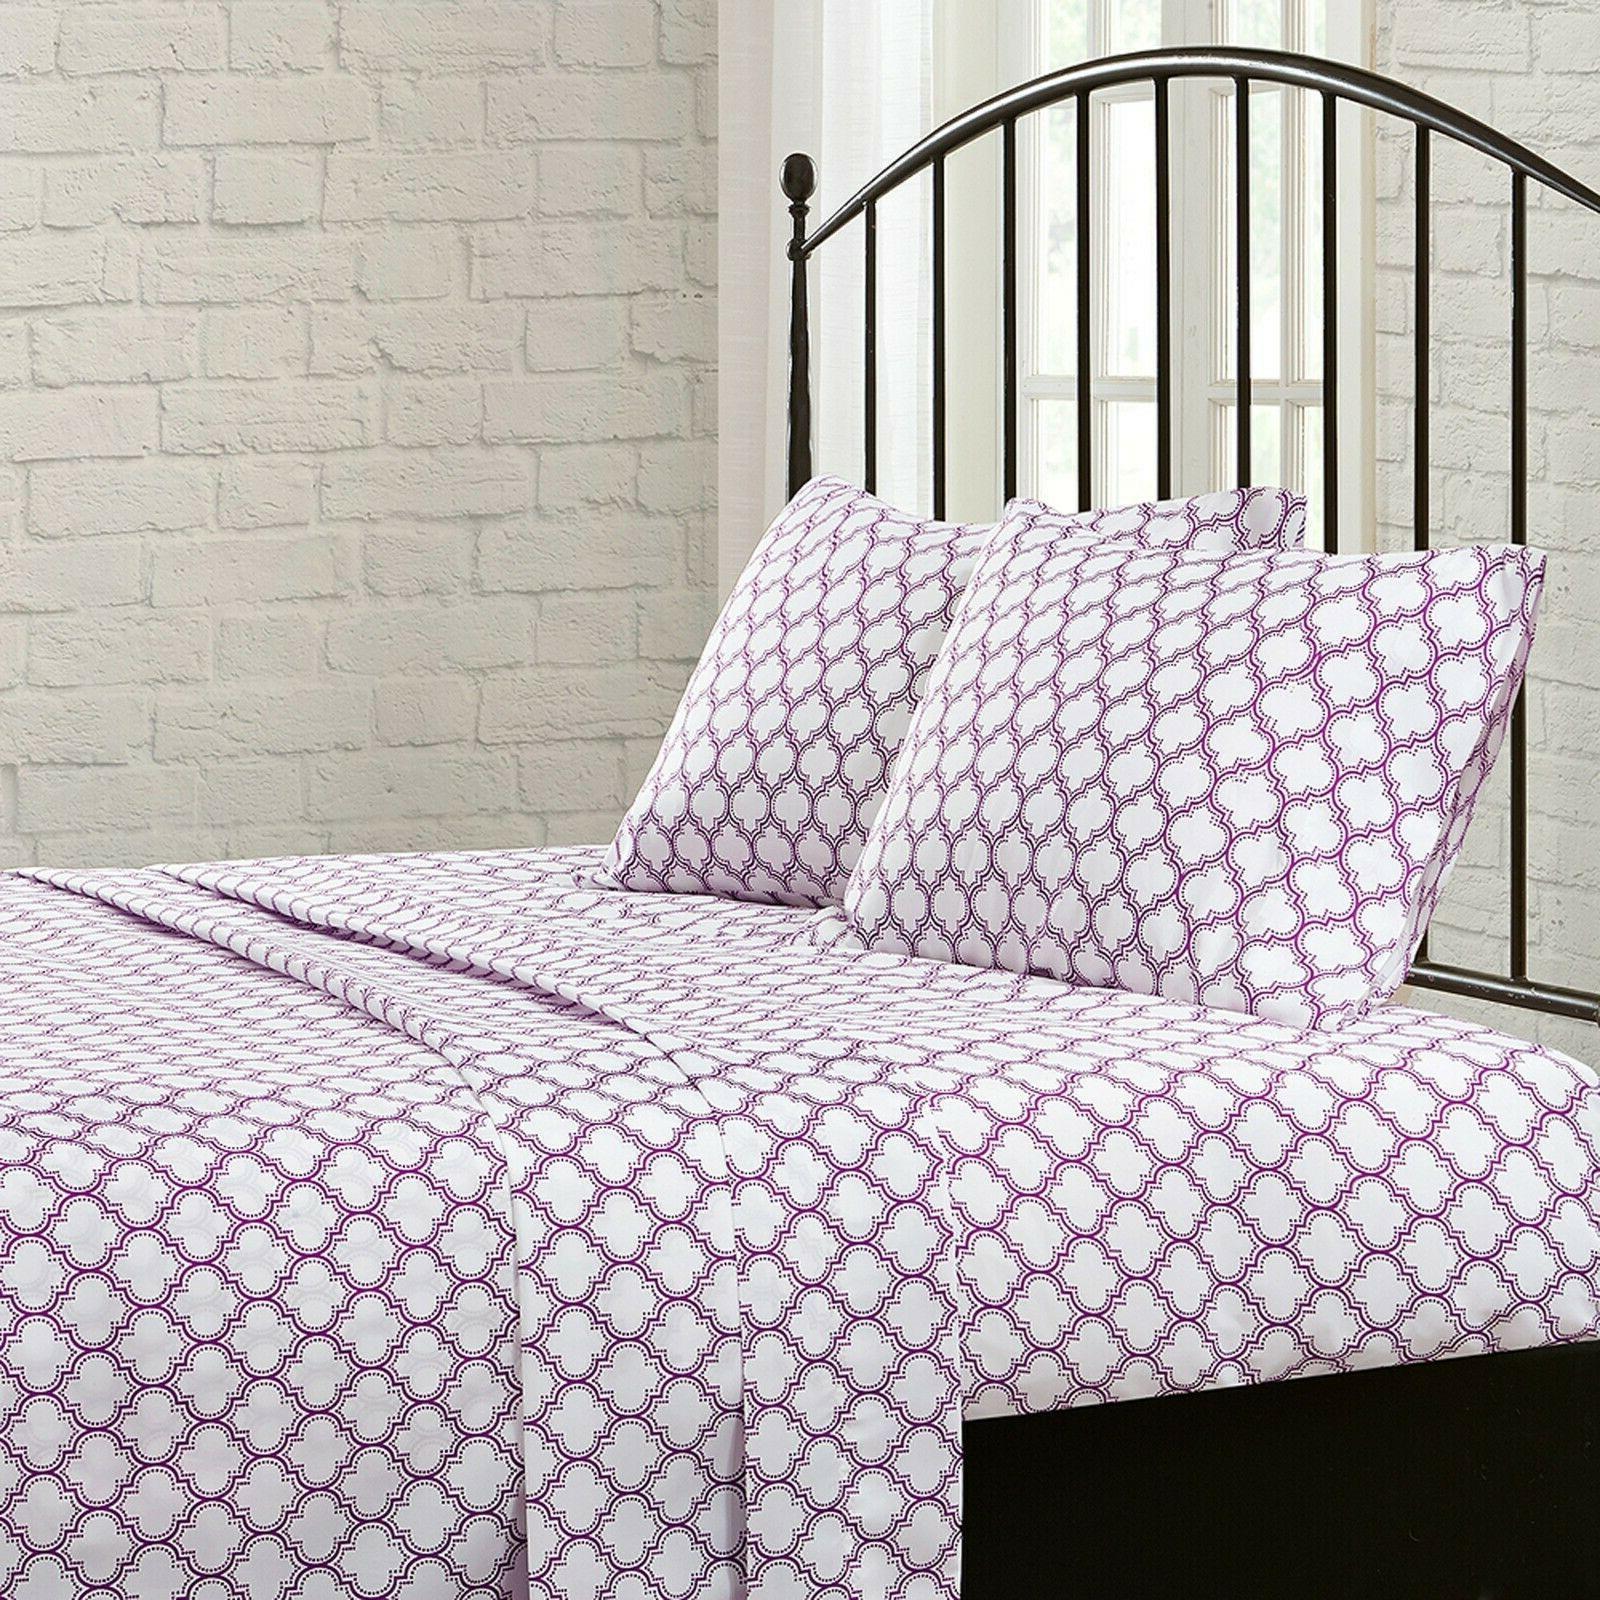 King Size Girls Set Comforter Sheets 8 Piece Comfort Purple